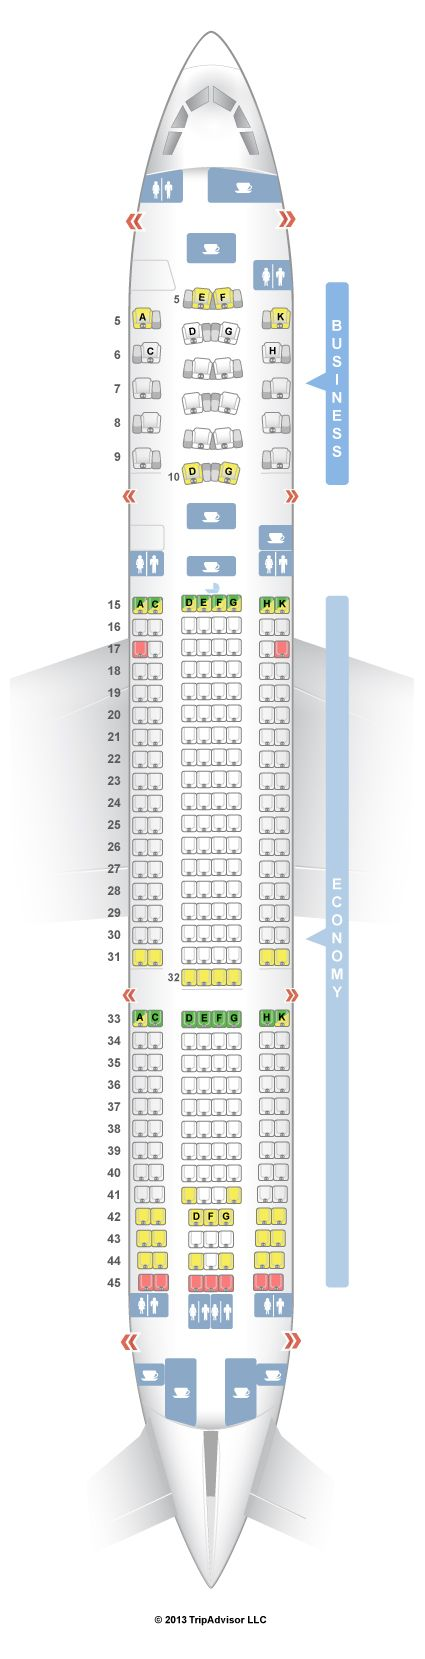 SeatGuru Seat Map Etihad Airbus A330-200 (332) V1 - SeatGuru